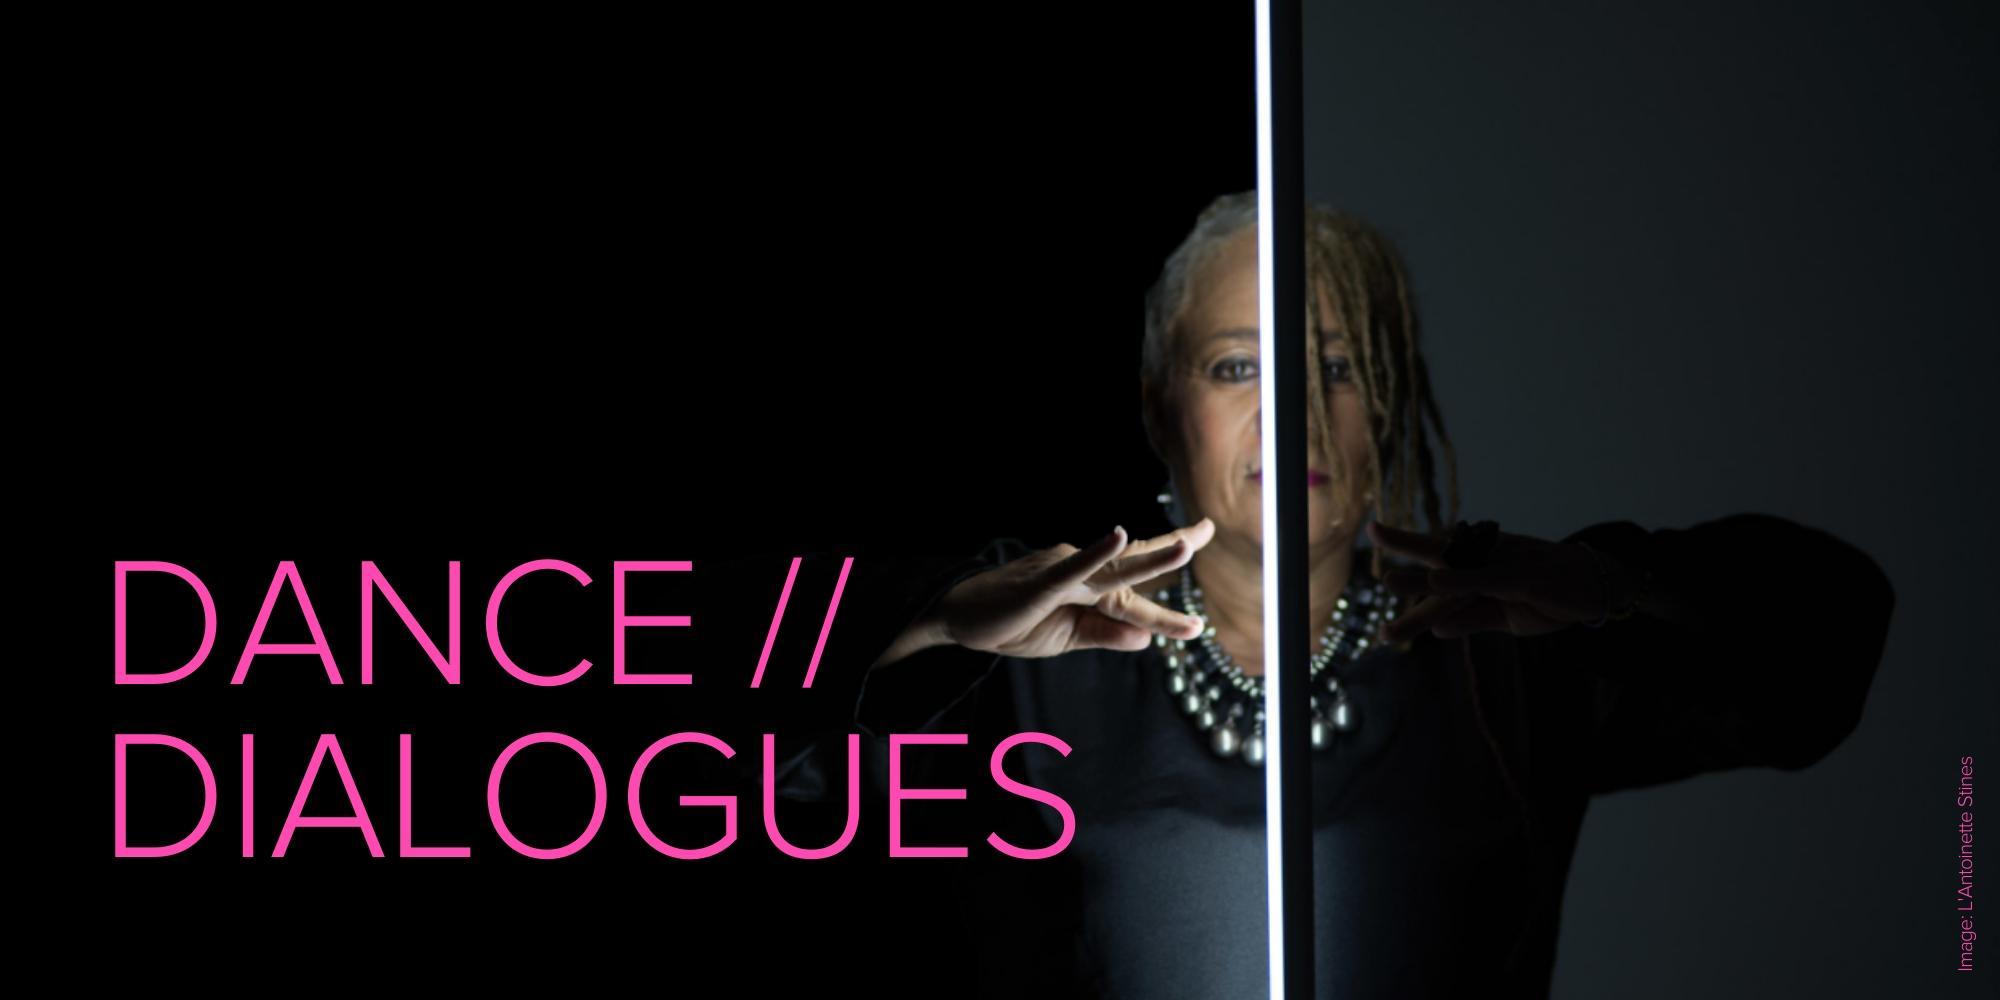 Dance Dialogues: L'Antoinette Stines — Page Banner